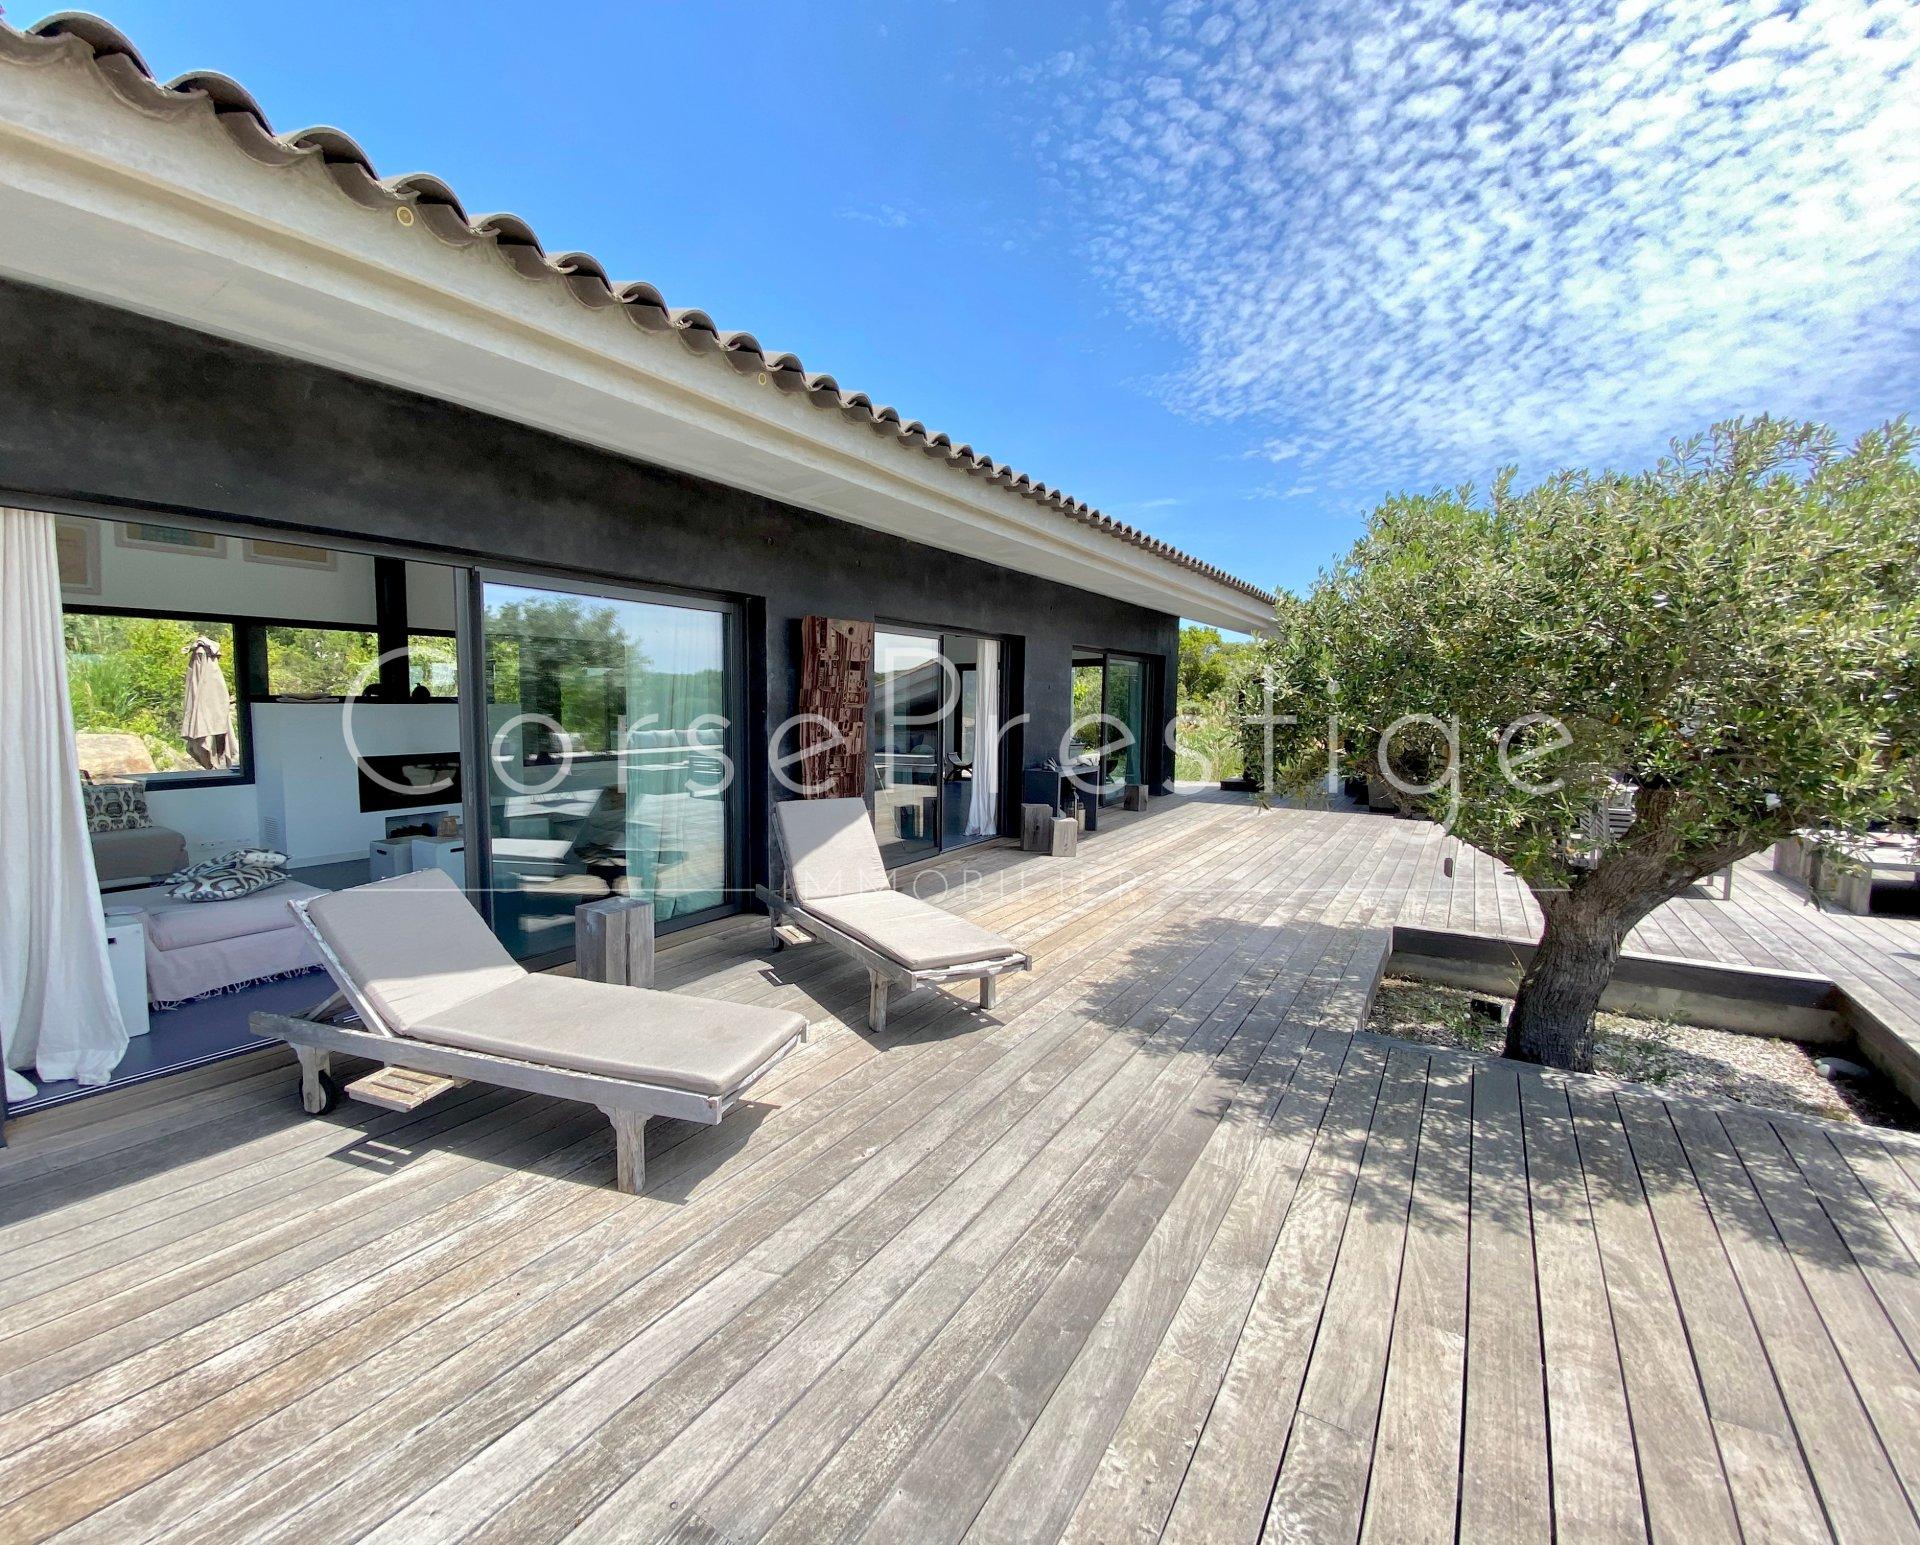 luxury property for sale in pianottoli caldarello image5